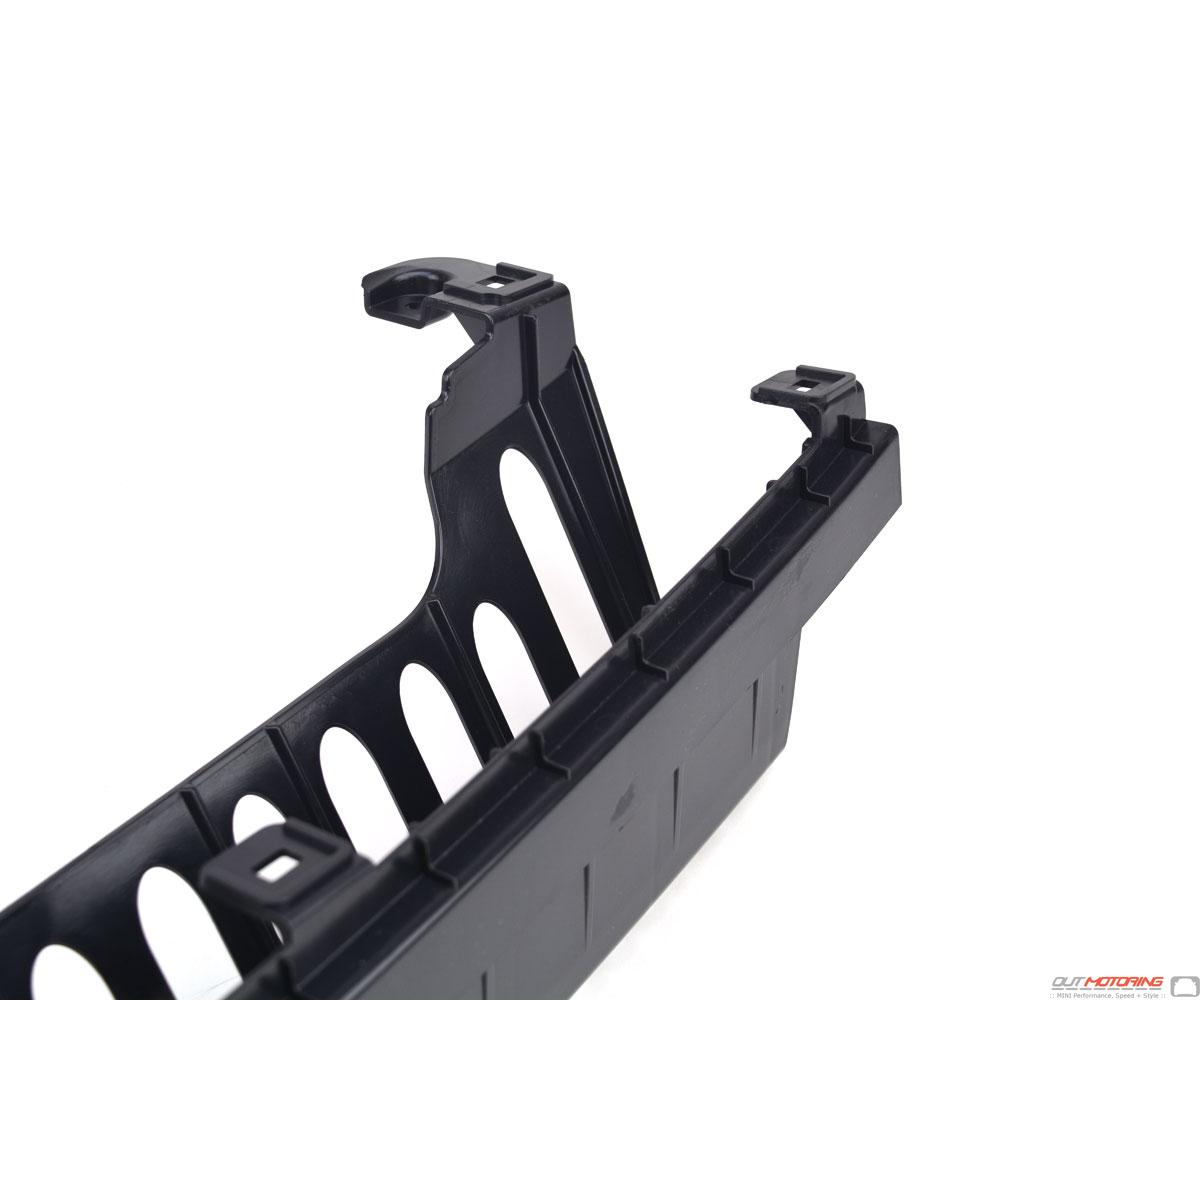 51129800757 MINI Cooper Replacements Rear Bumper Guide